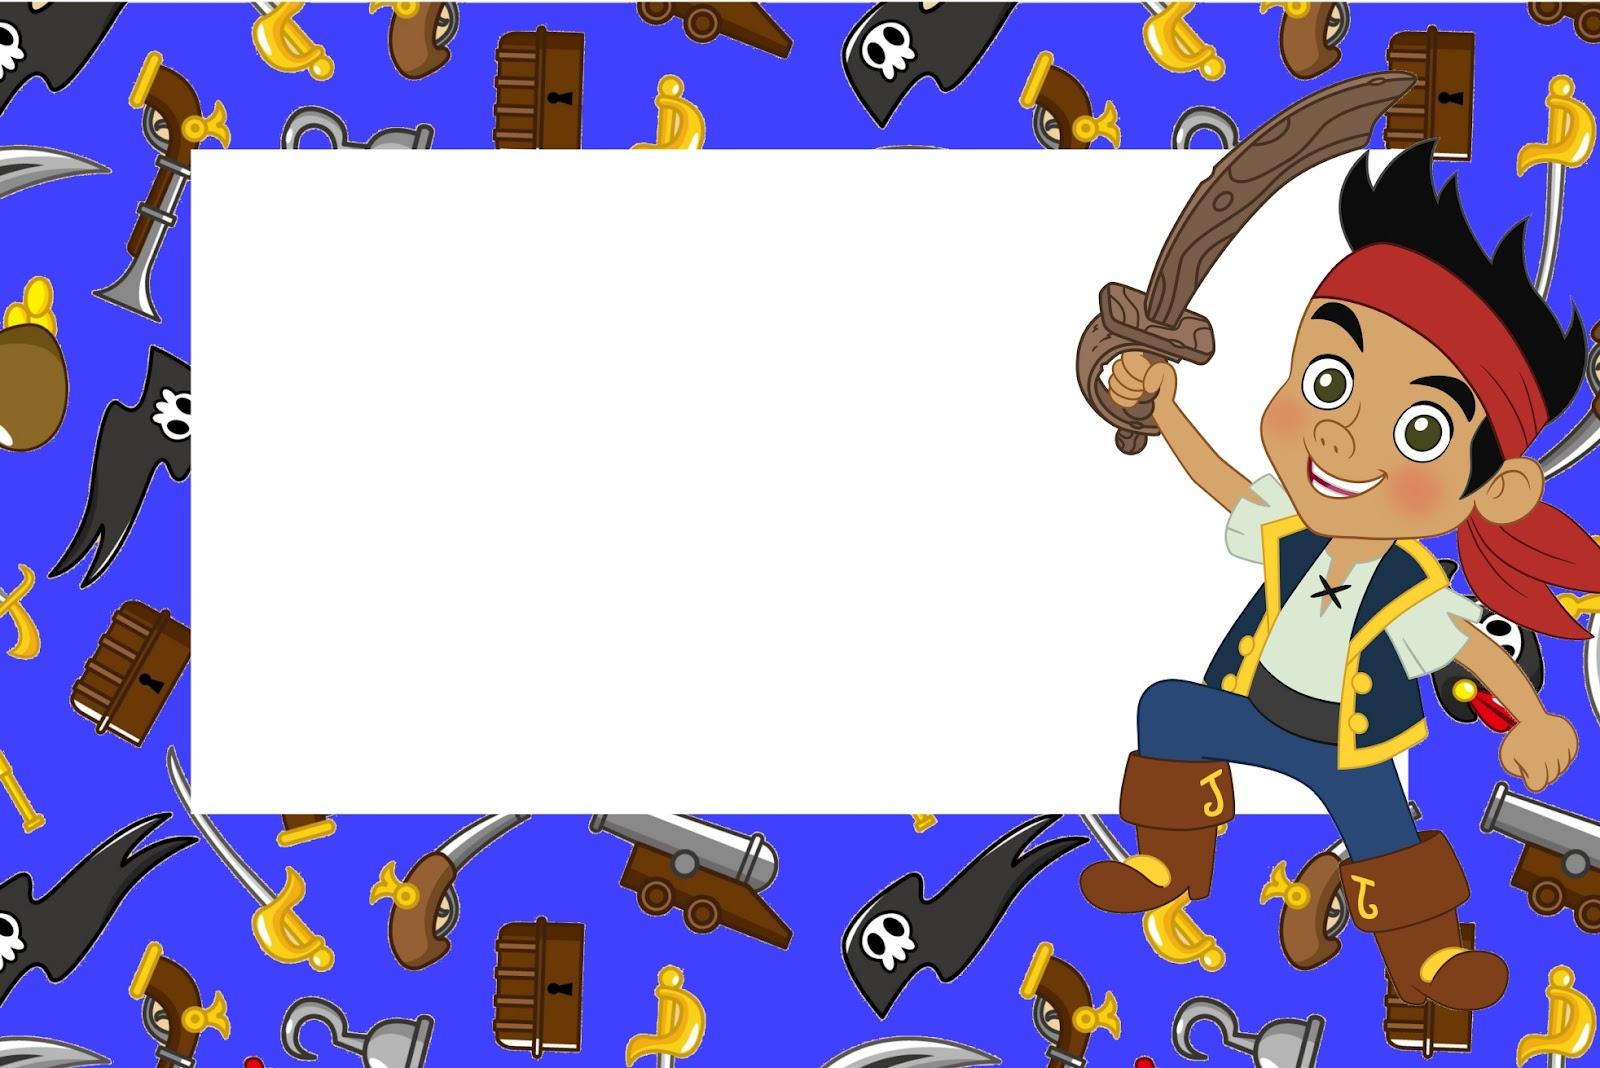 Jake and the neverland pirates invitations